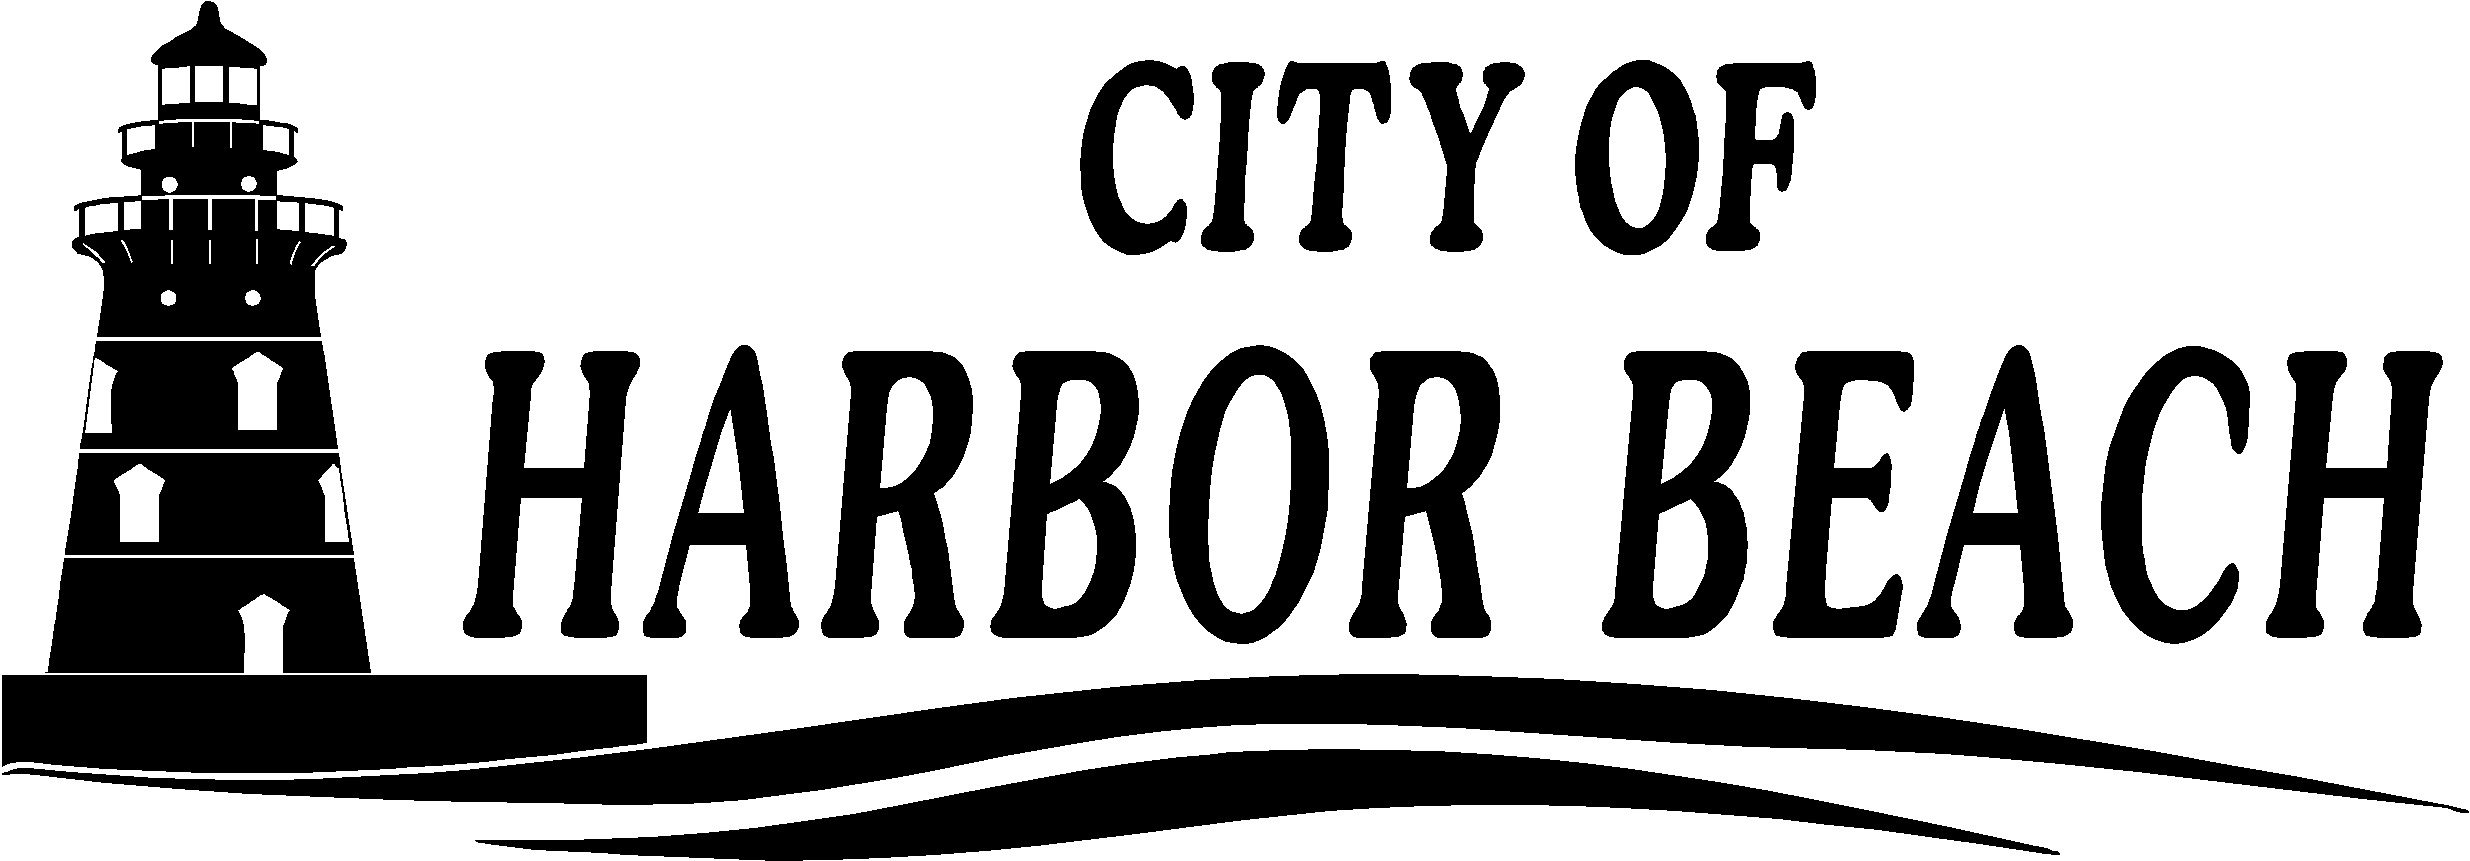 City of Harbor Beach Logo